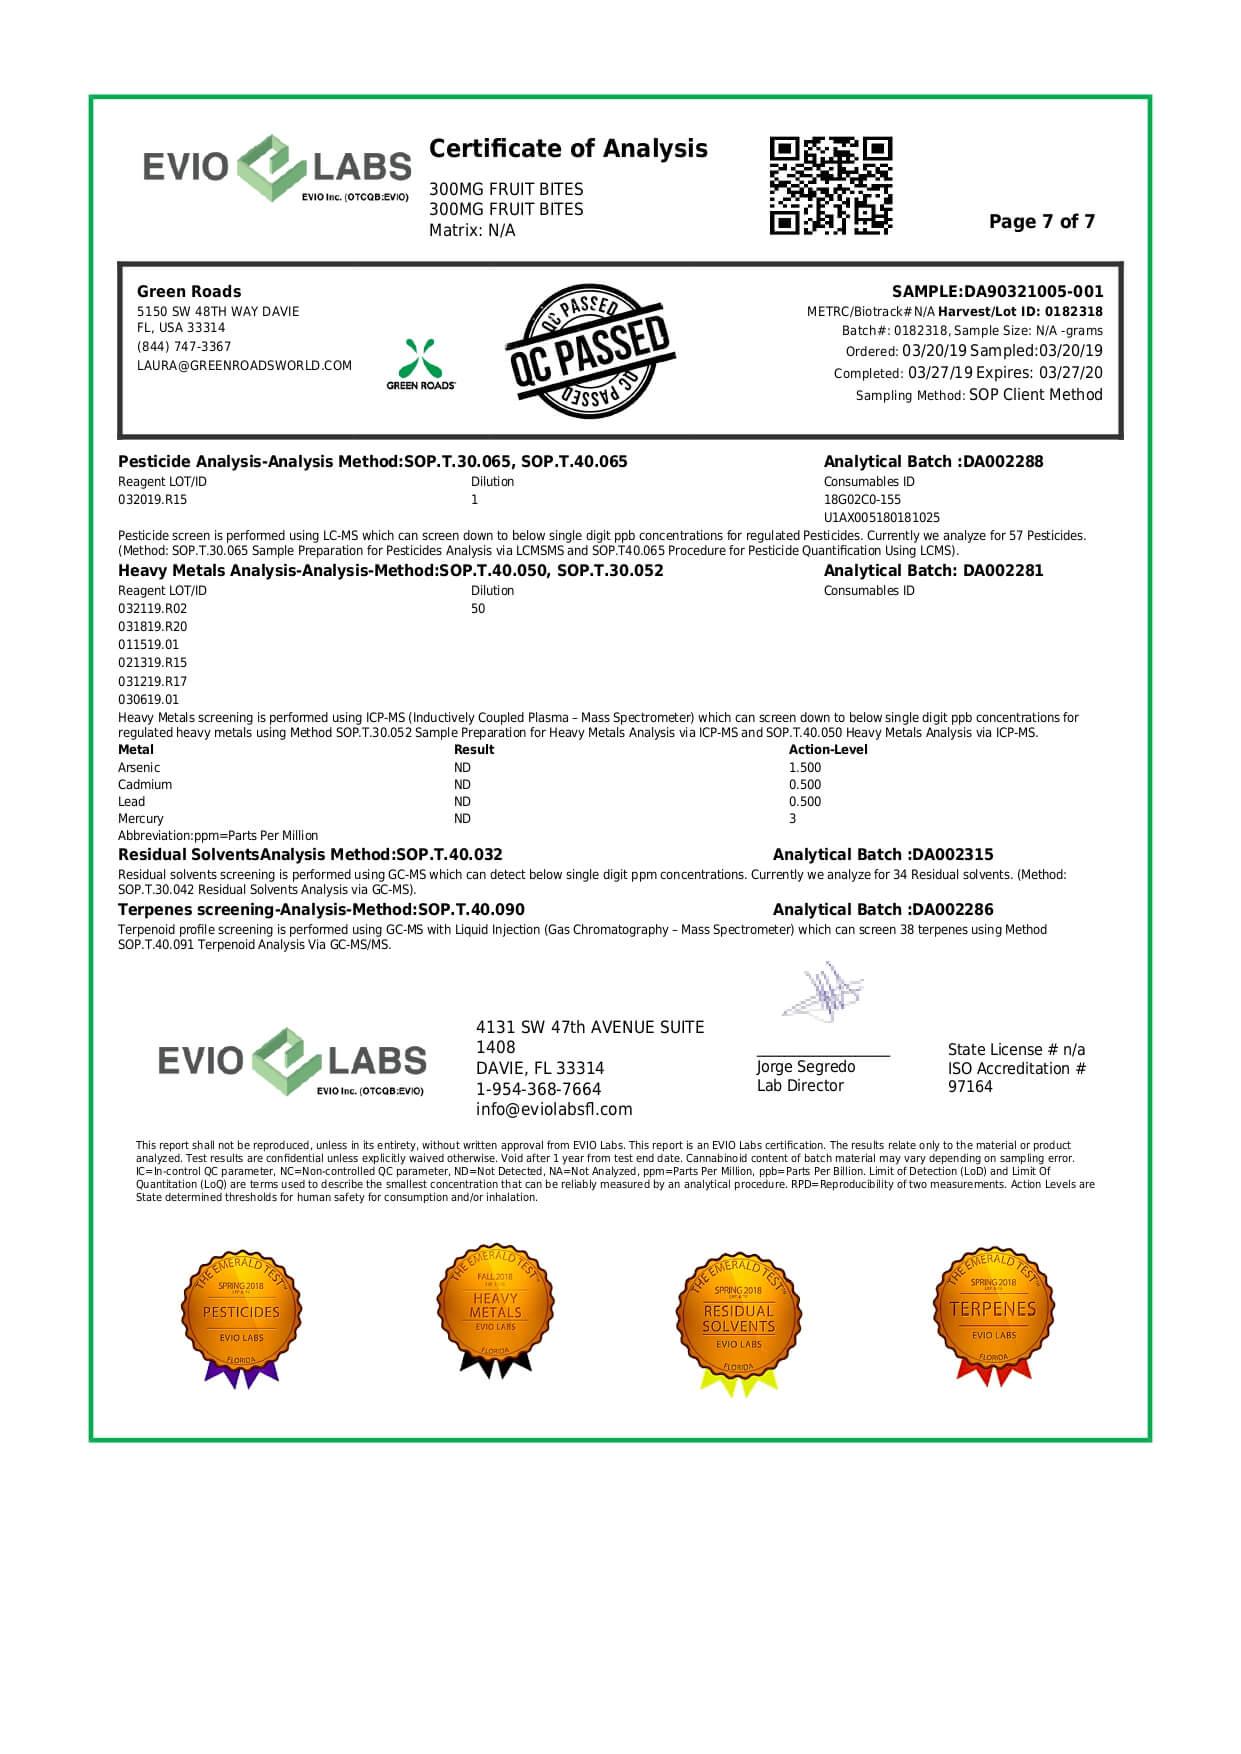 Green Roads CBD Edible Fruit Bites 300mg Lab Report